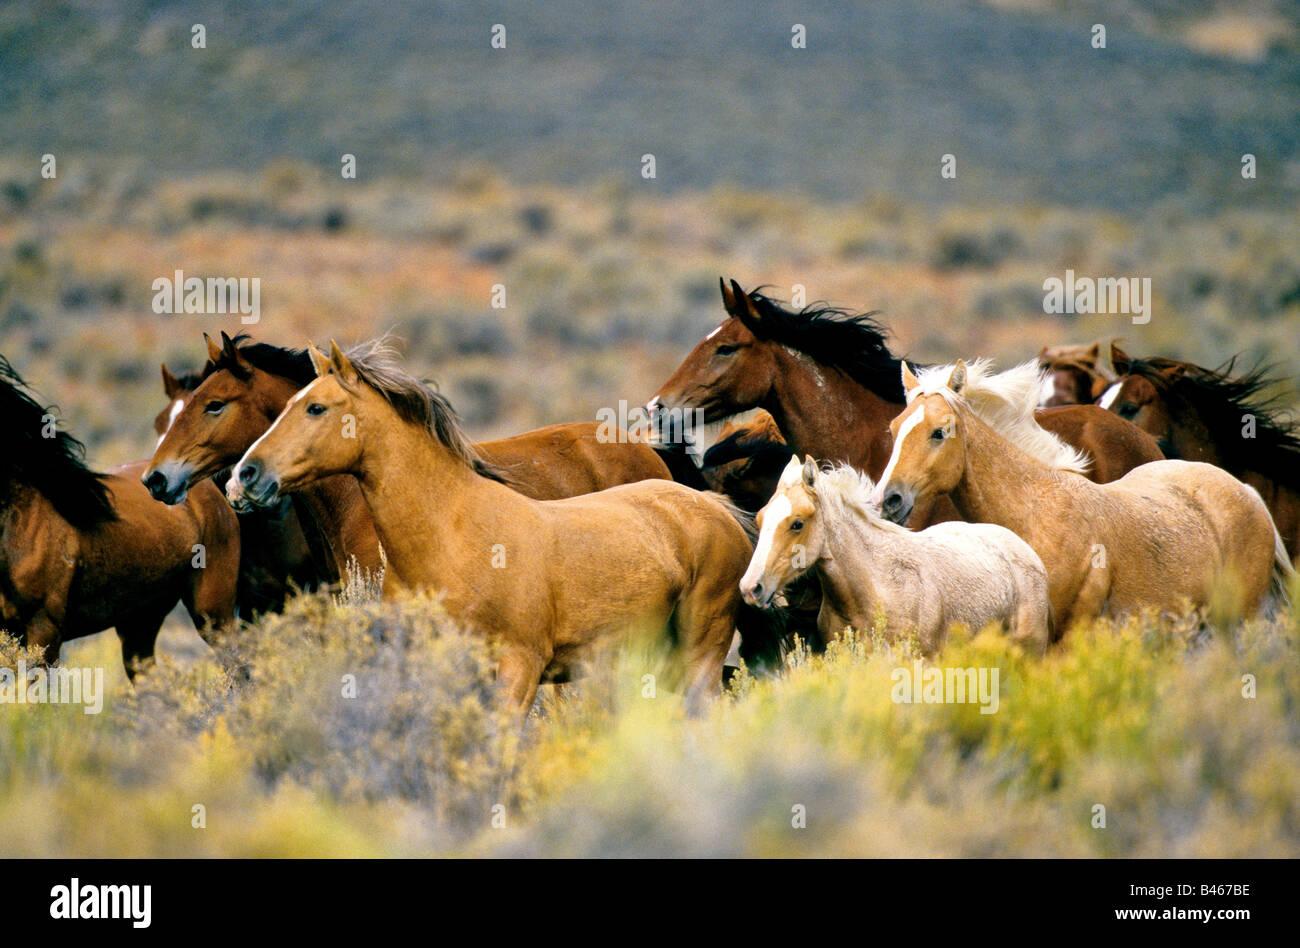 Wild horses running high desert. Stock Photo